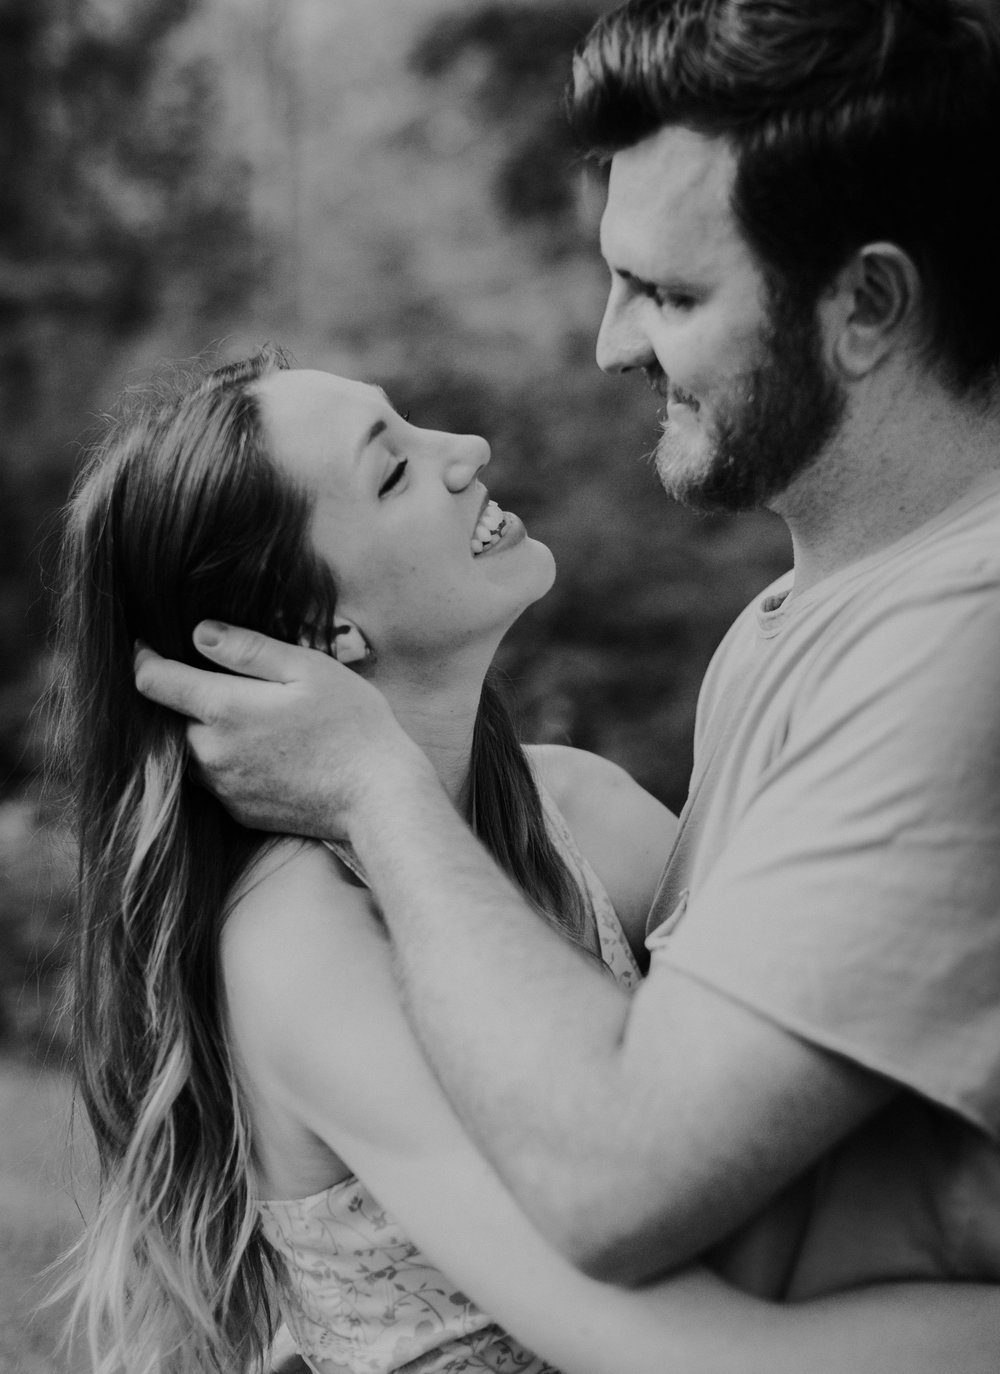 Charis_Lauren_Romantic_Wedding_Photographer_Nashville_03A0437.jpg